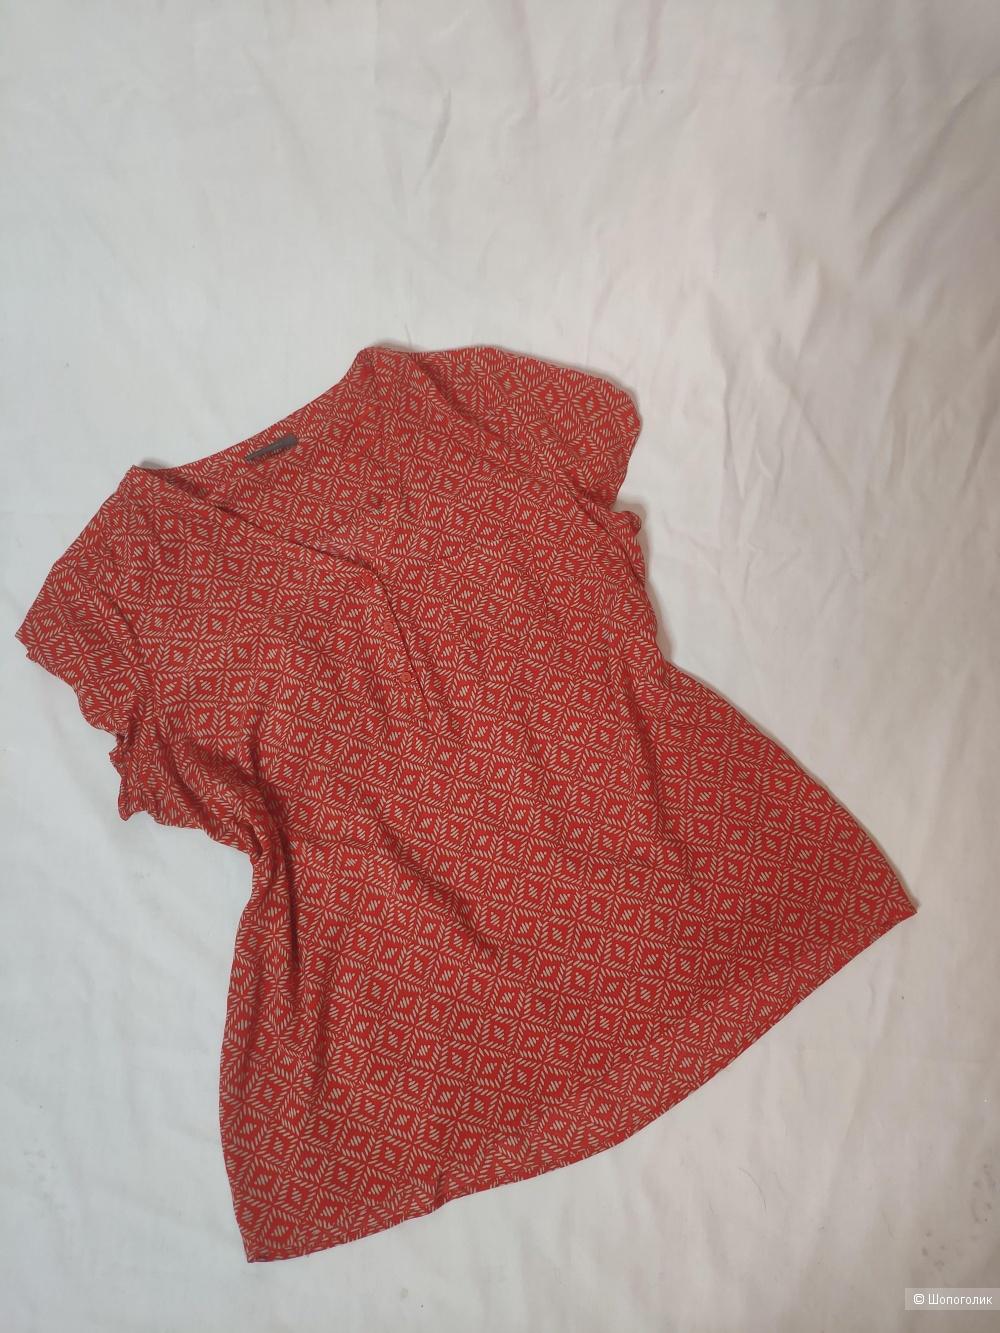 Топ/рубашка марки Yessika, размер 50 российский